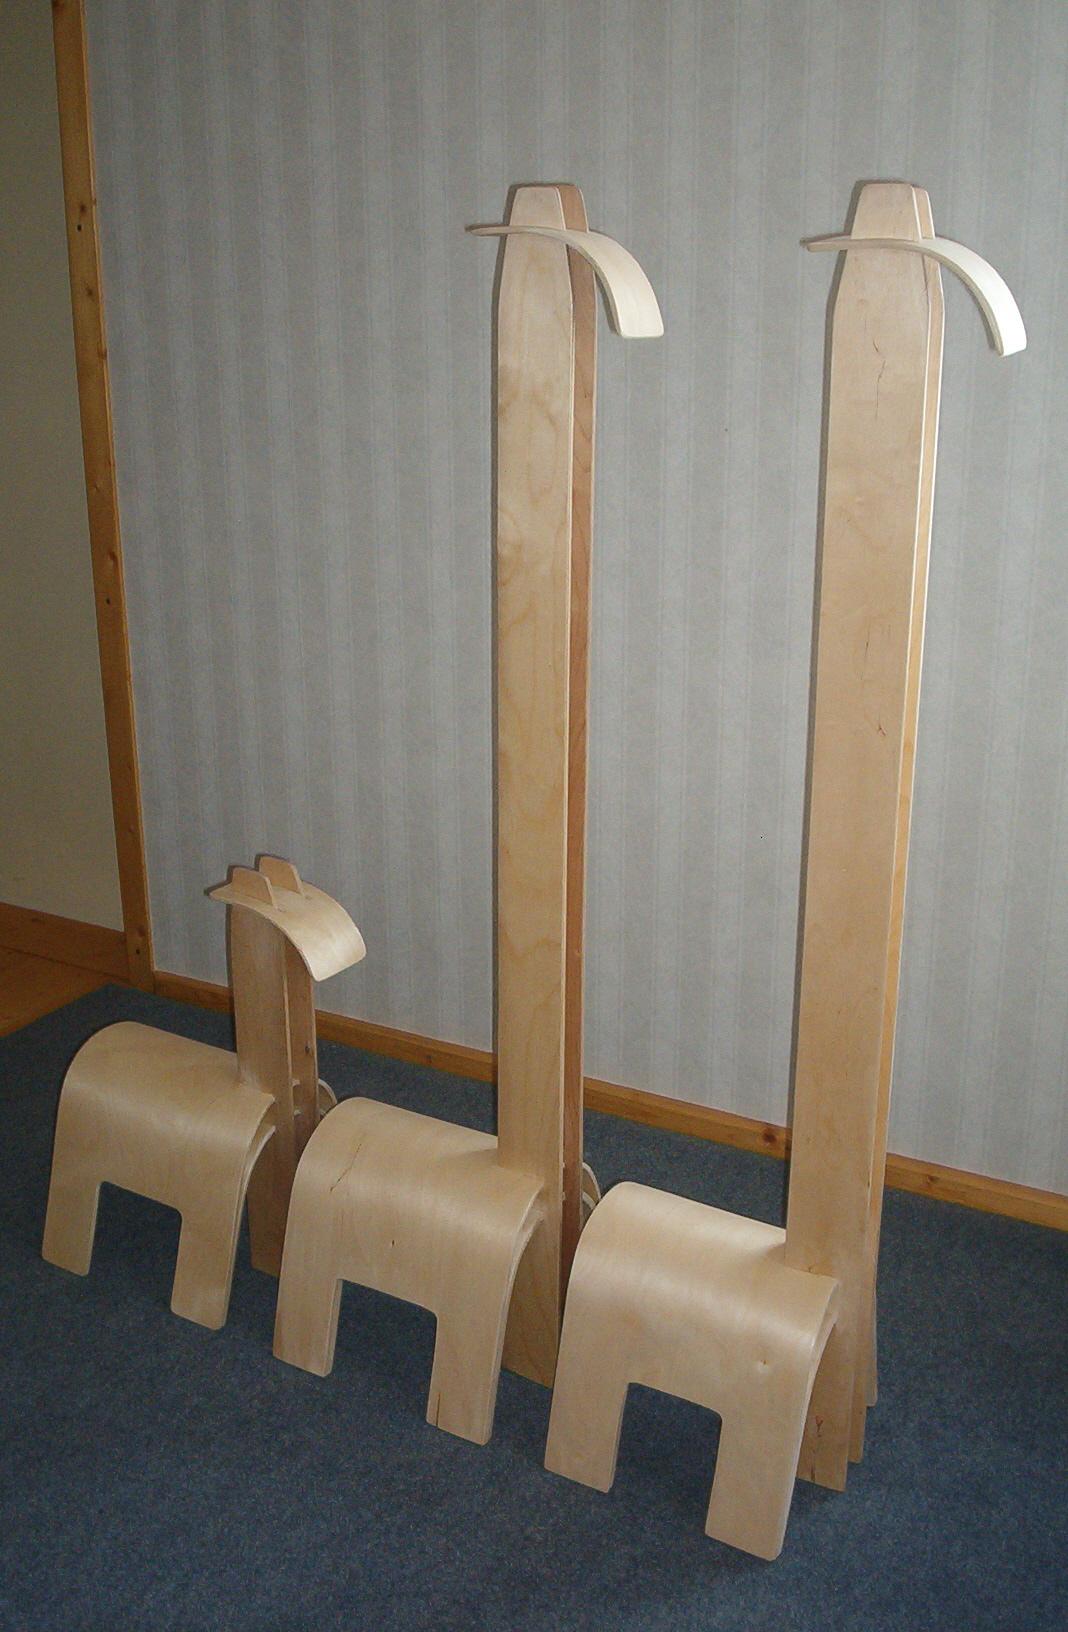 smaller wooden horse next to two wooden giraffes